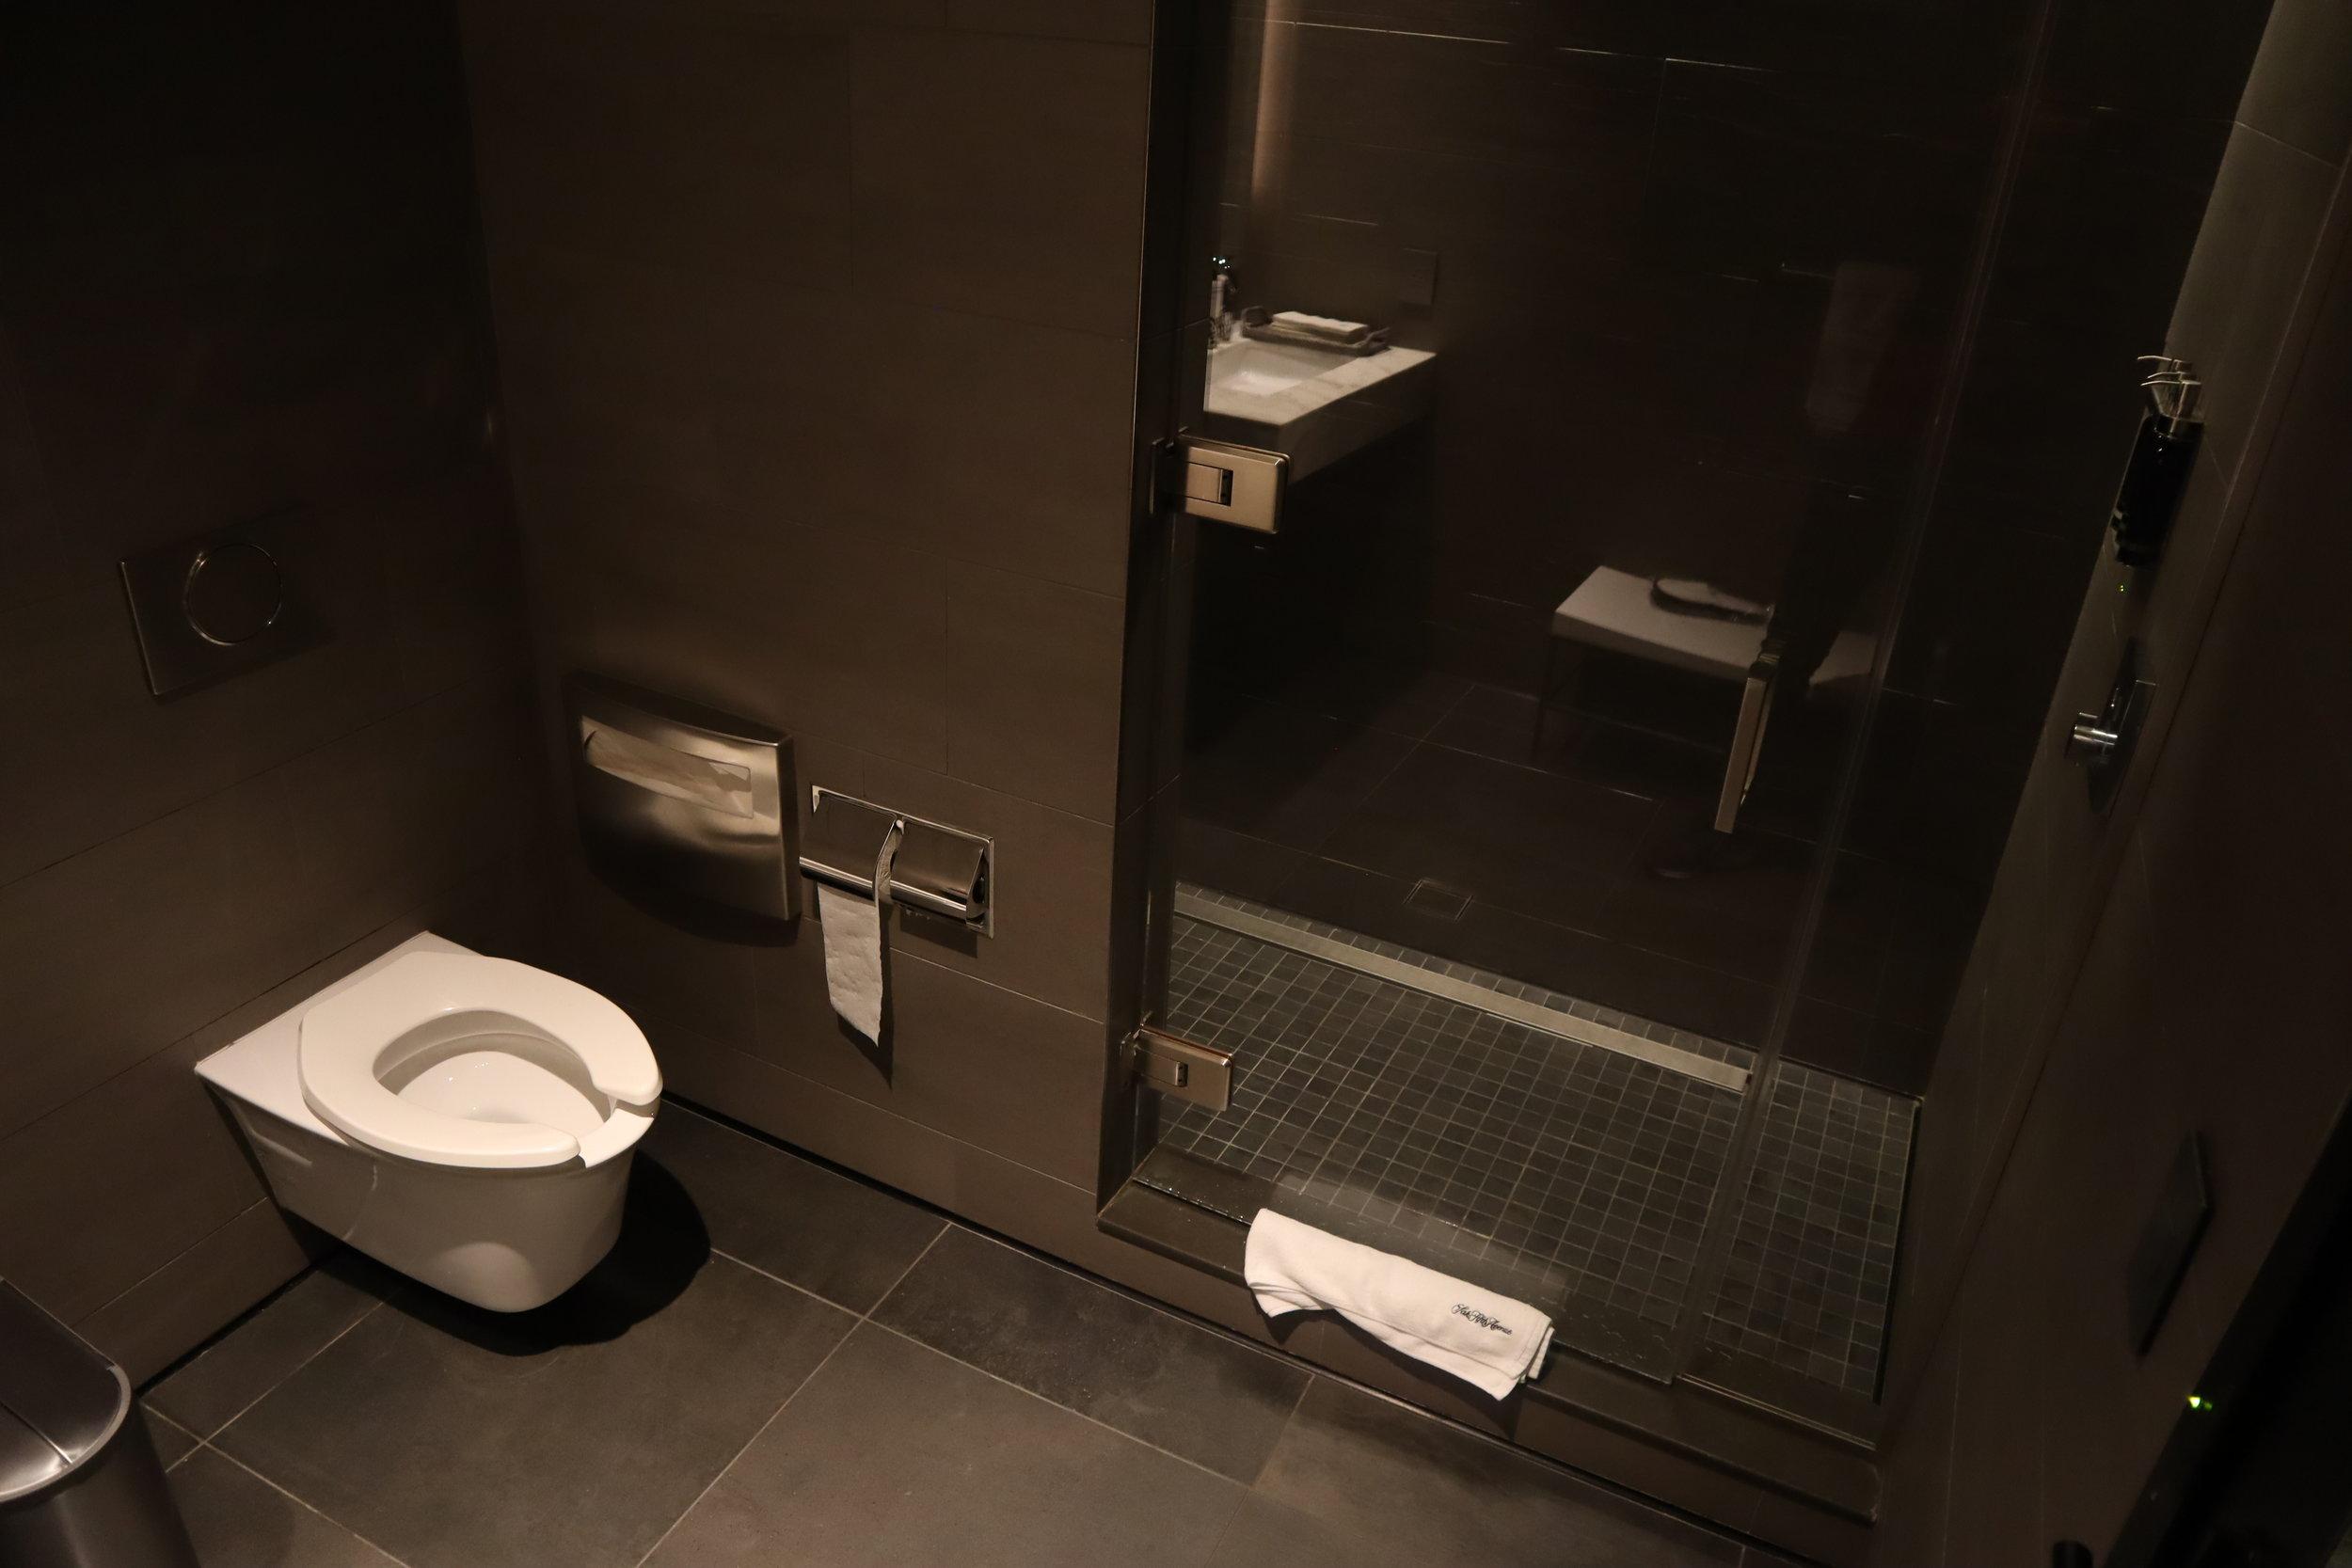 United Polaris Lounge Newark – Shower suite